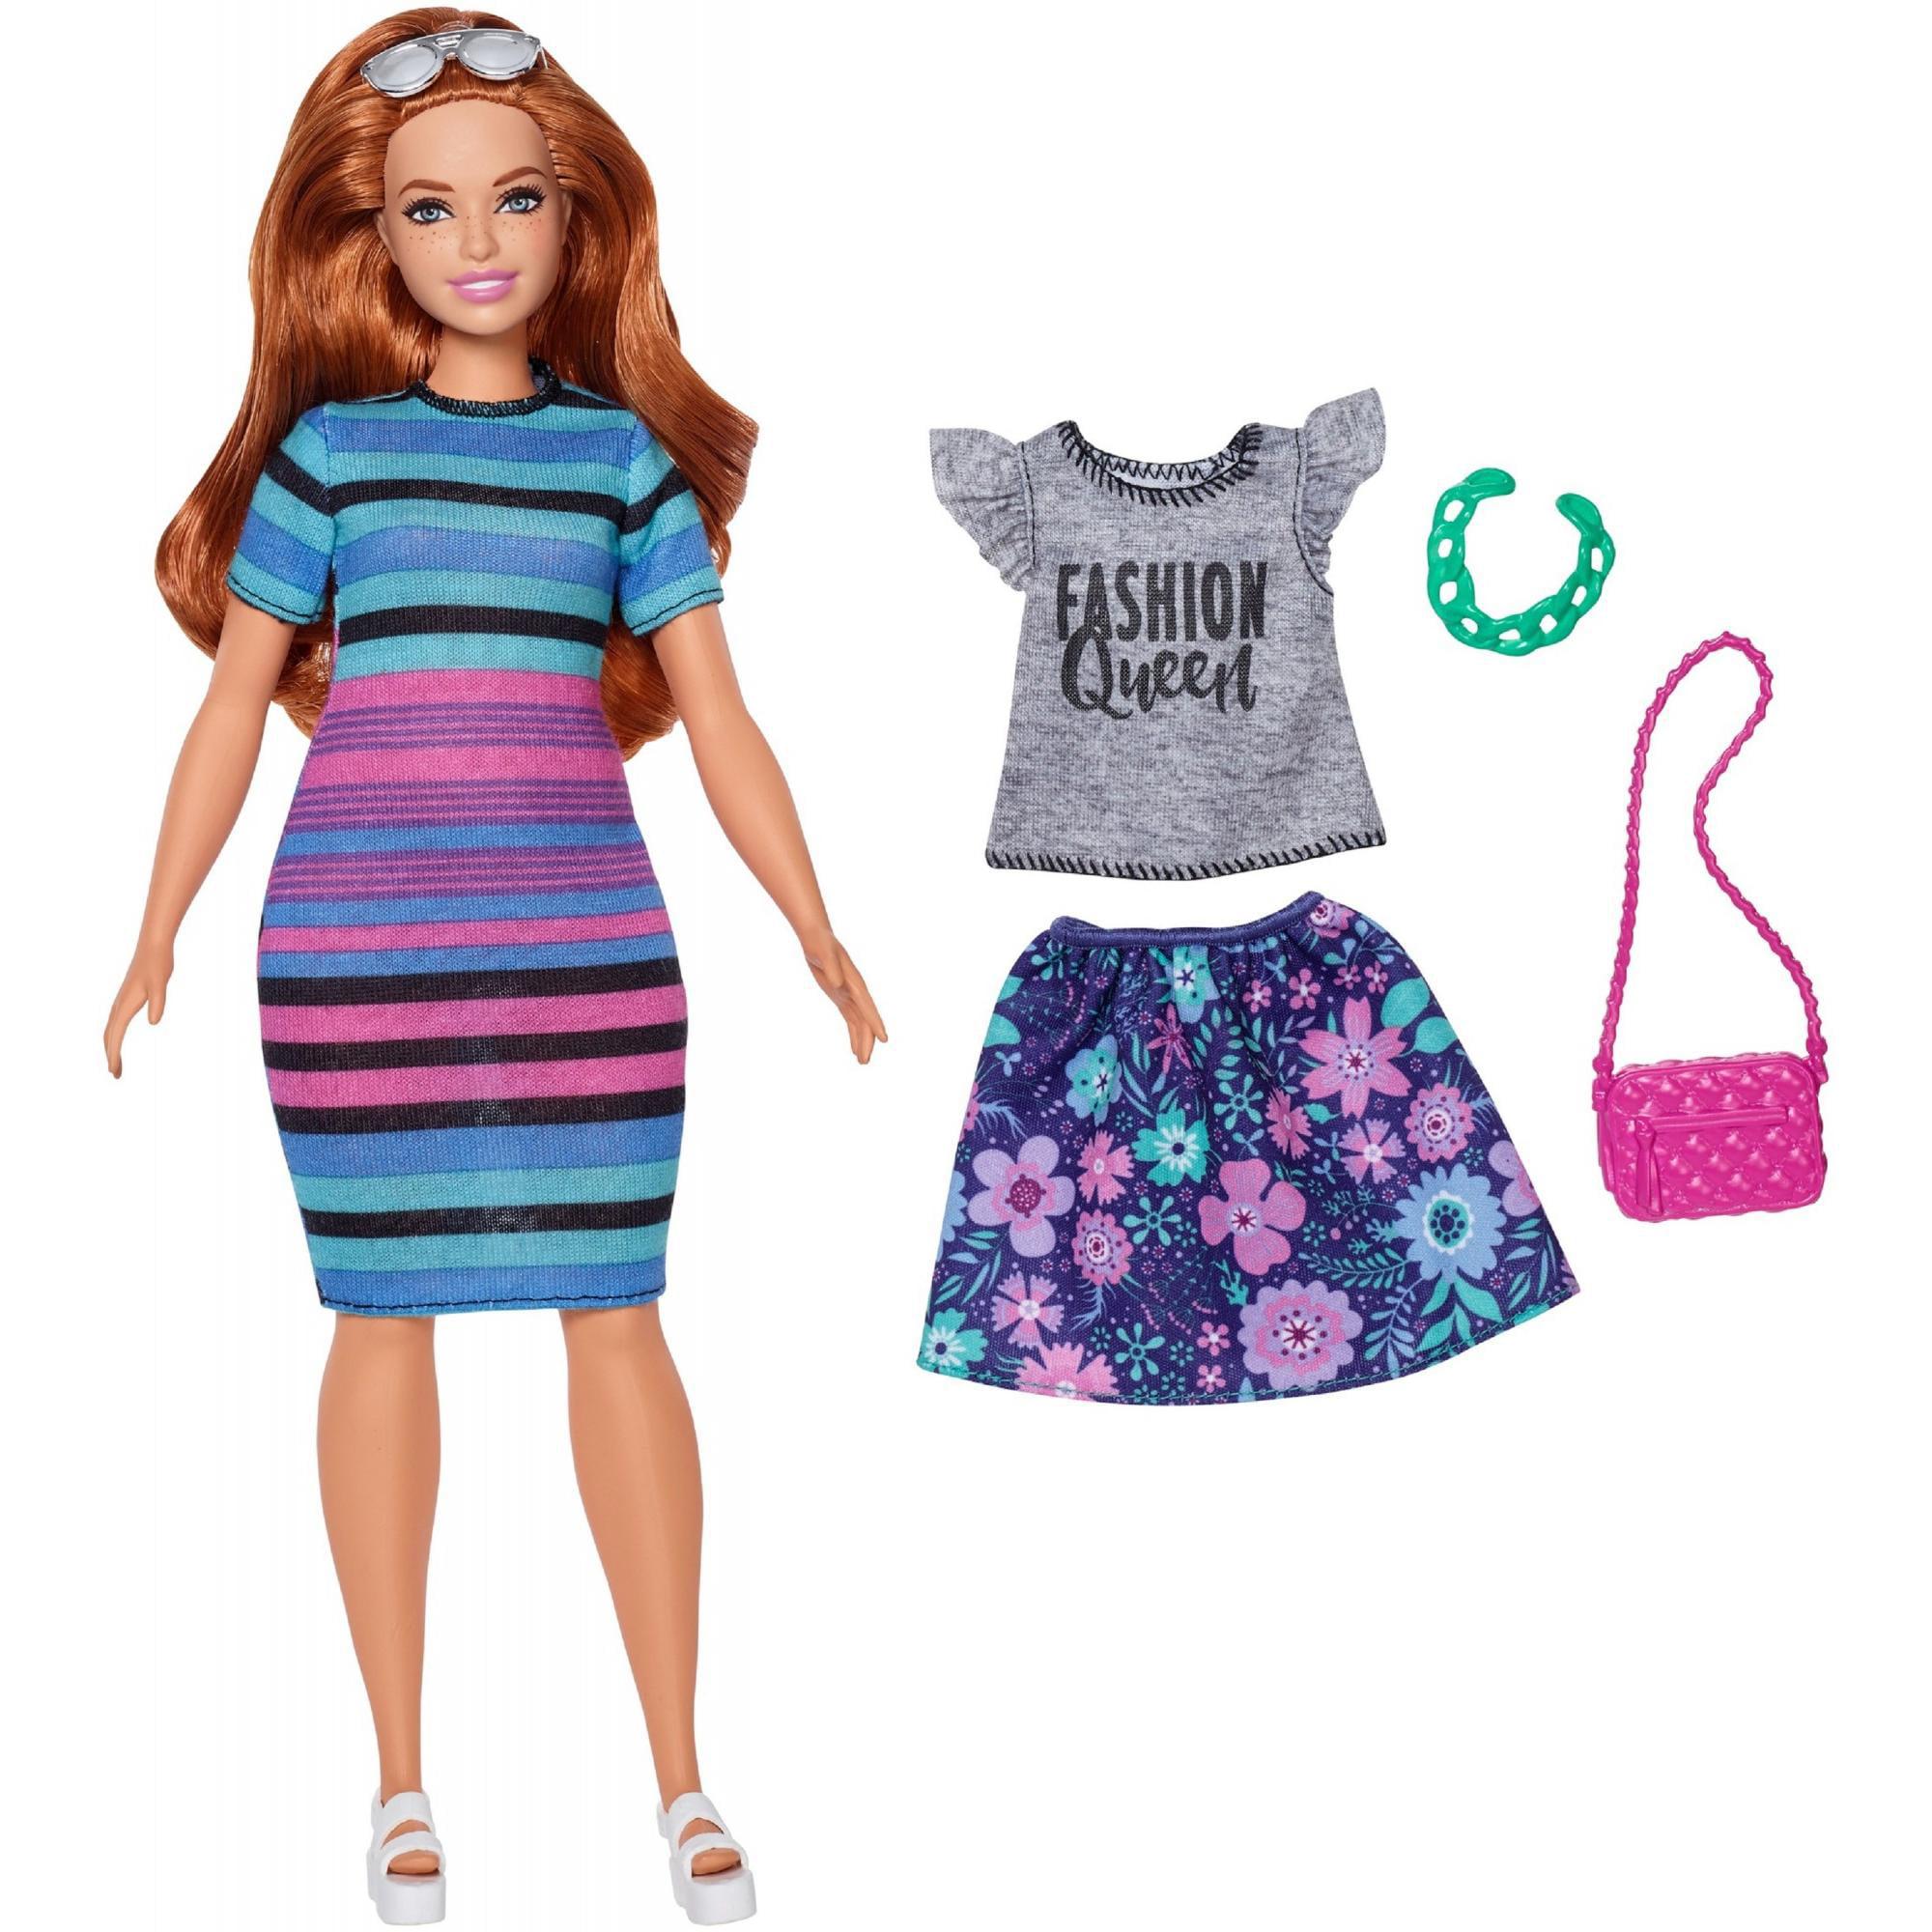 Dolls NEW Barbie Fashionista Curvy Doll Purple Lace Skirt ~ Clothing Clothing